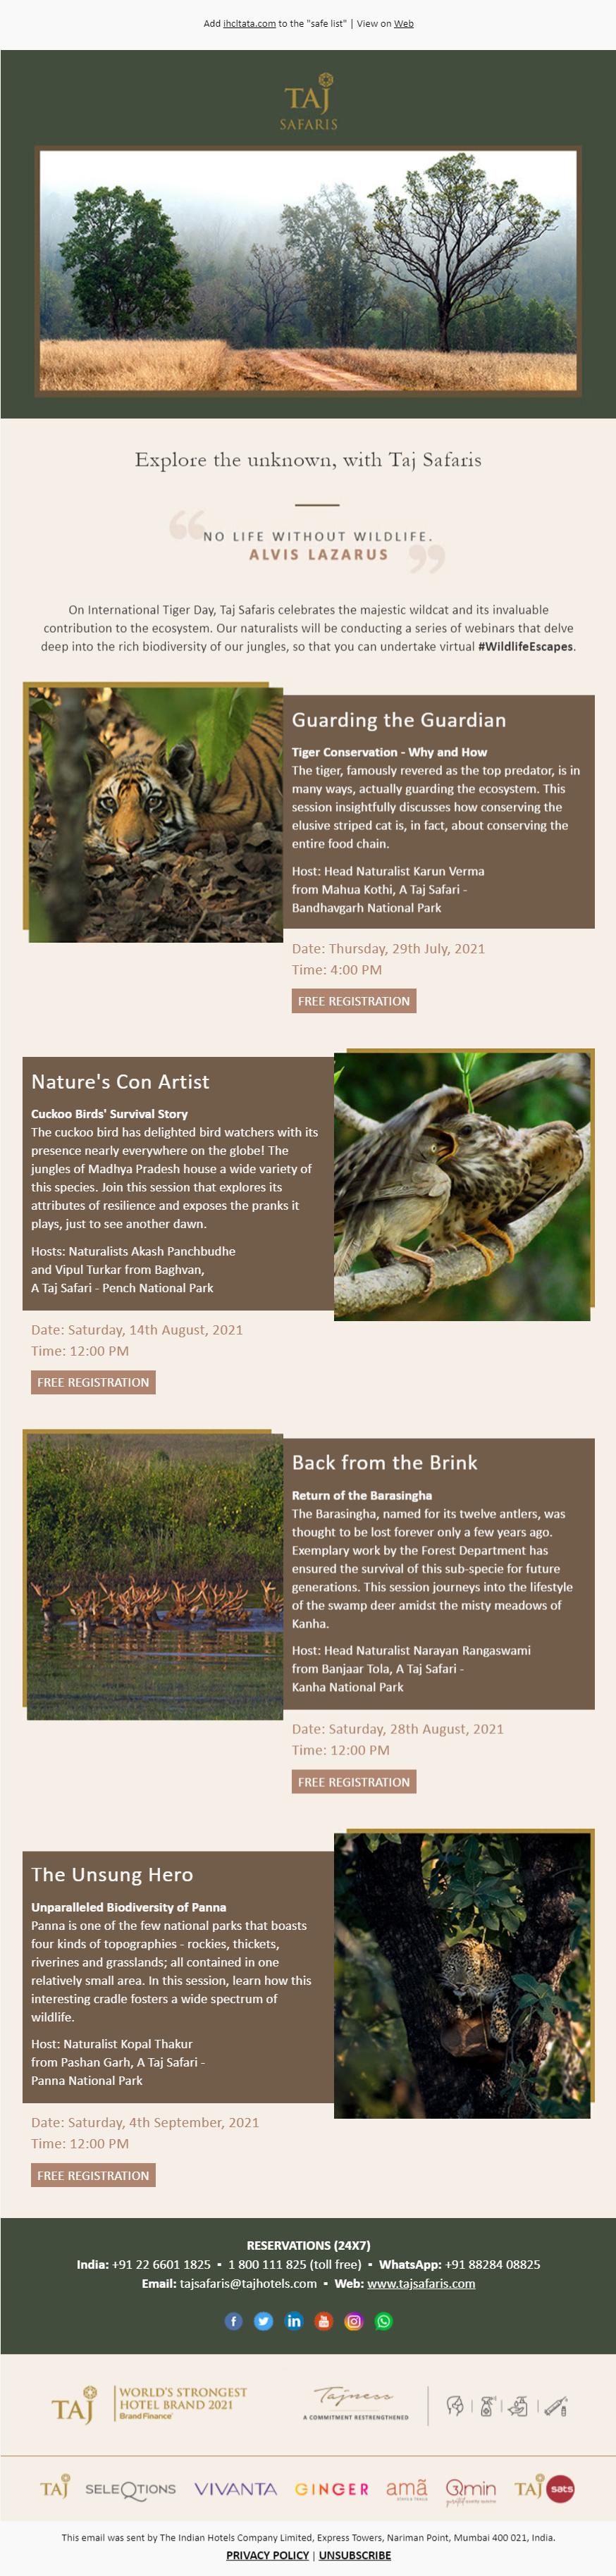 Email example by Taj Safaris